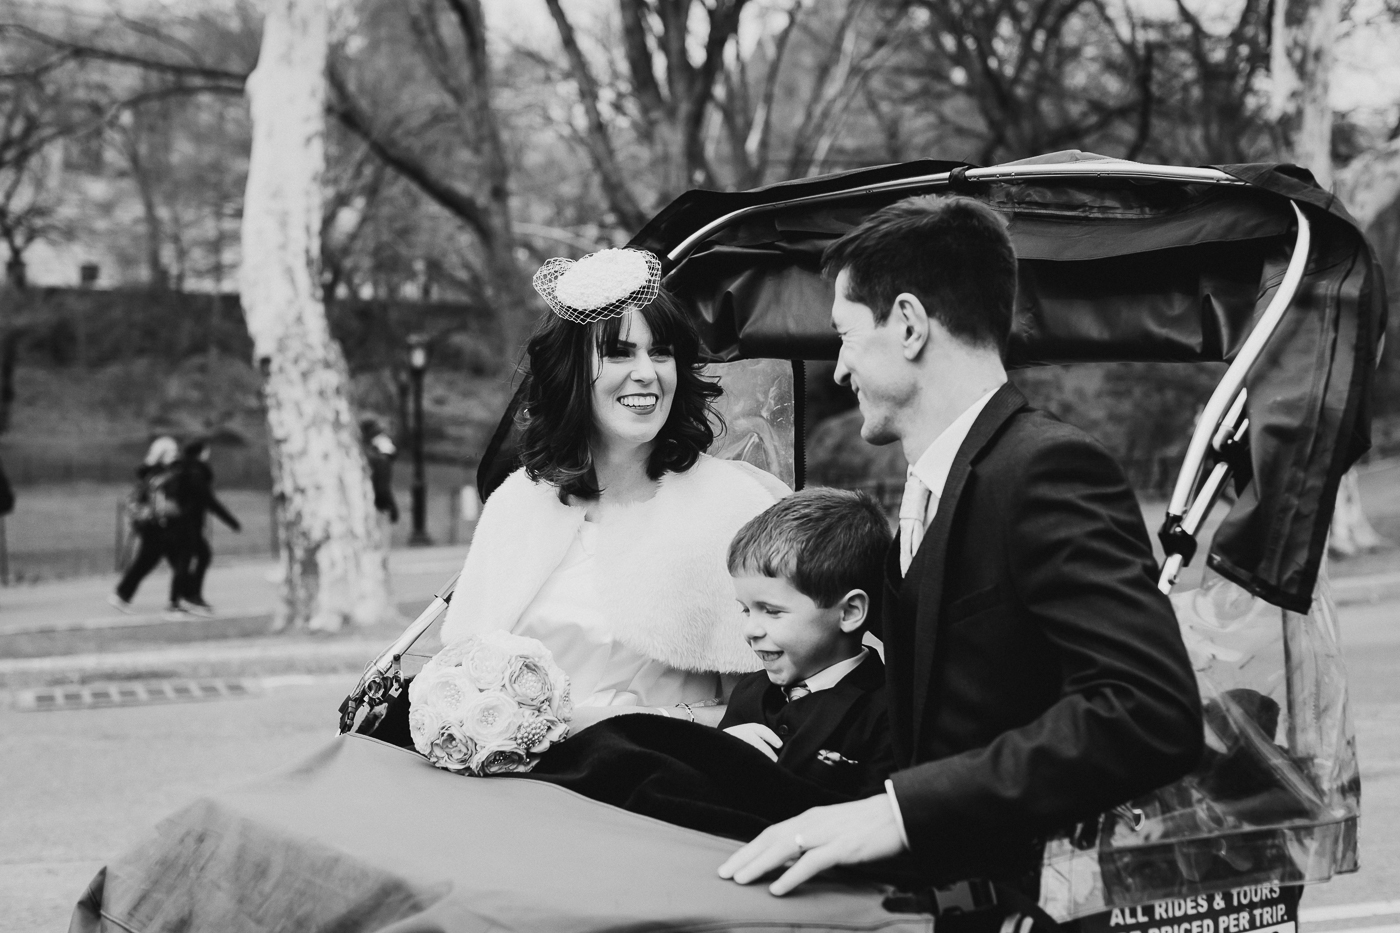 Ladies-Pavilion-Central-Park-NYC-Documentary-Elopement-Wedding-Photographer-40.jpg